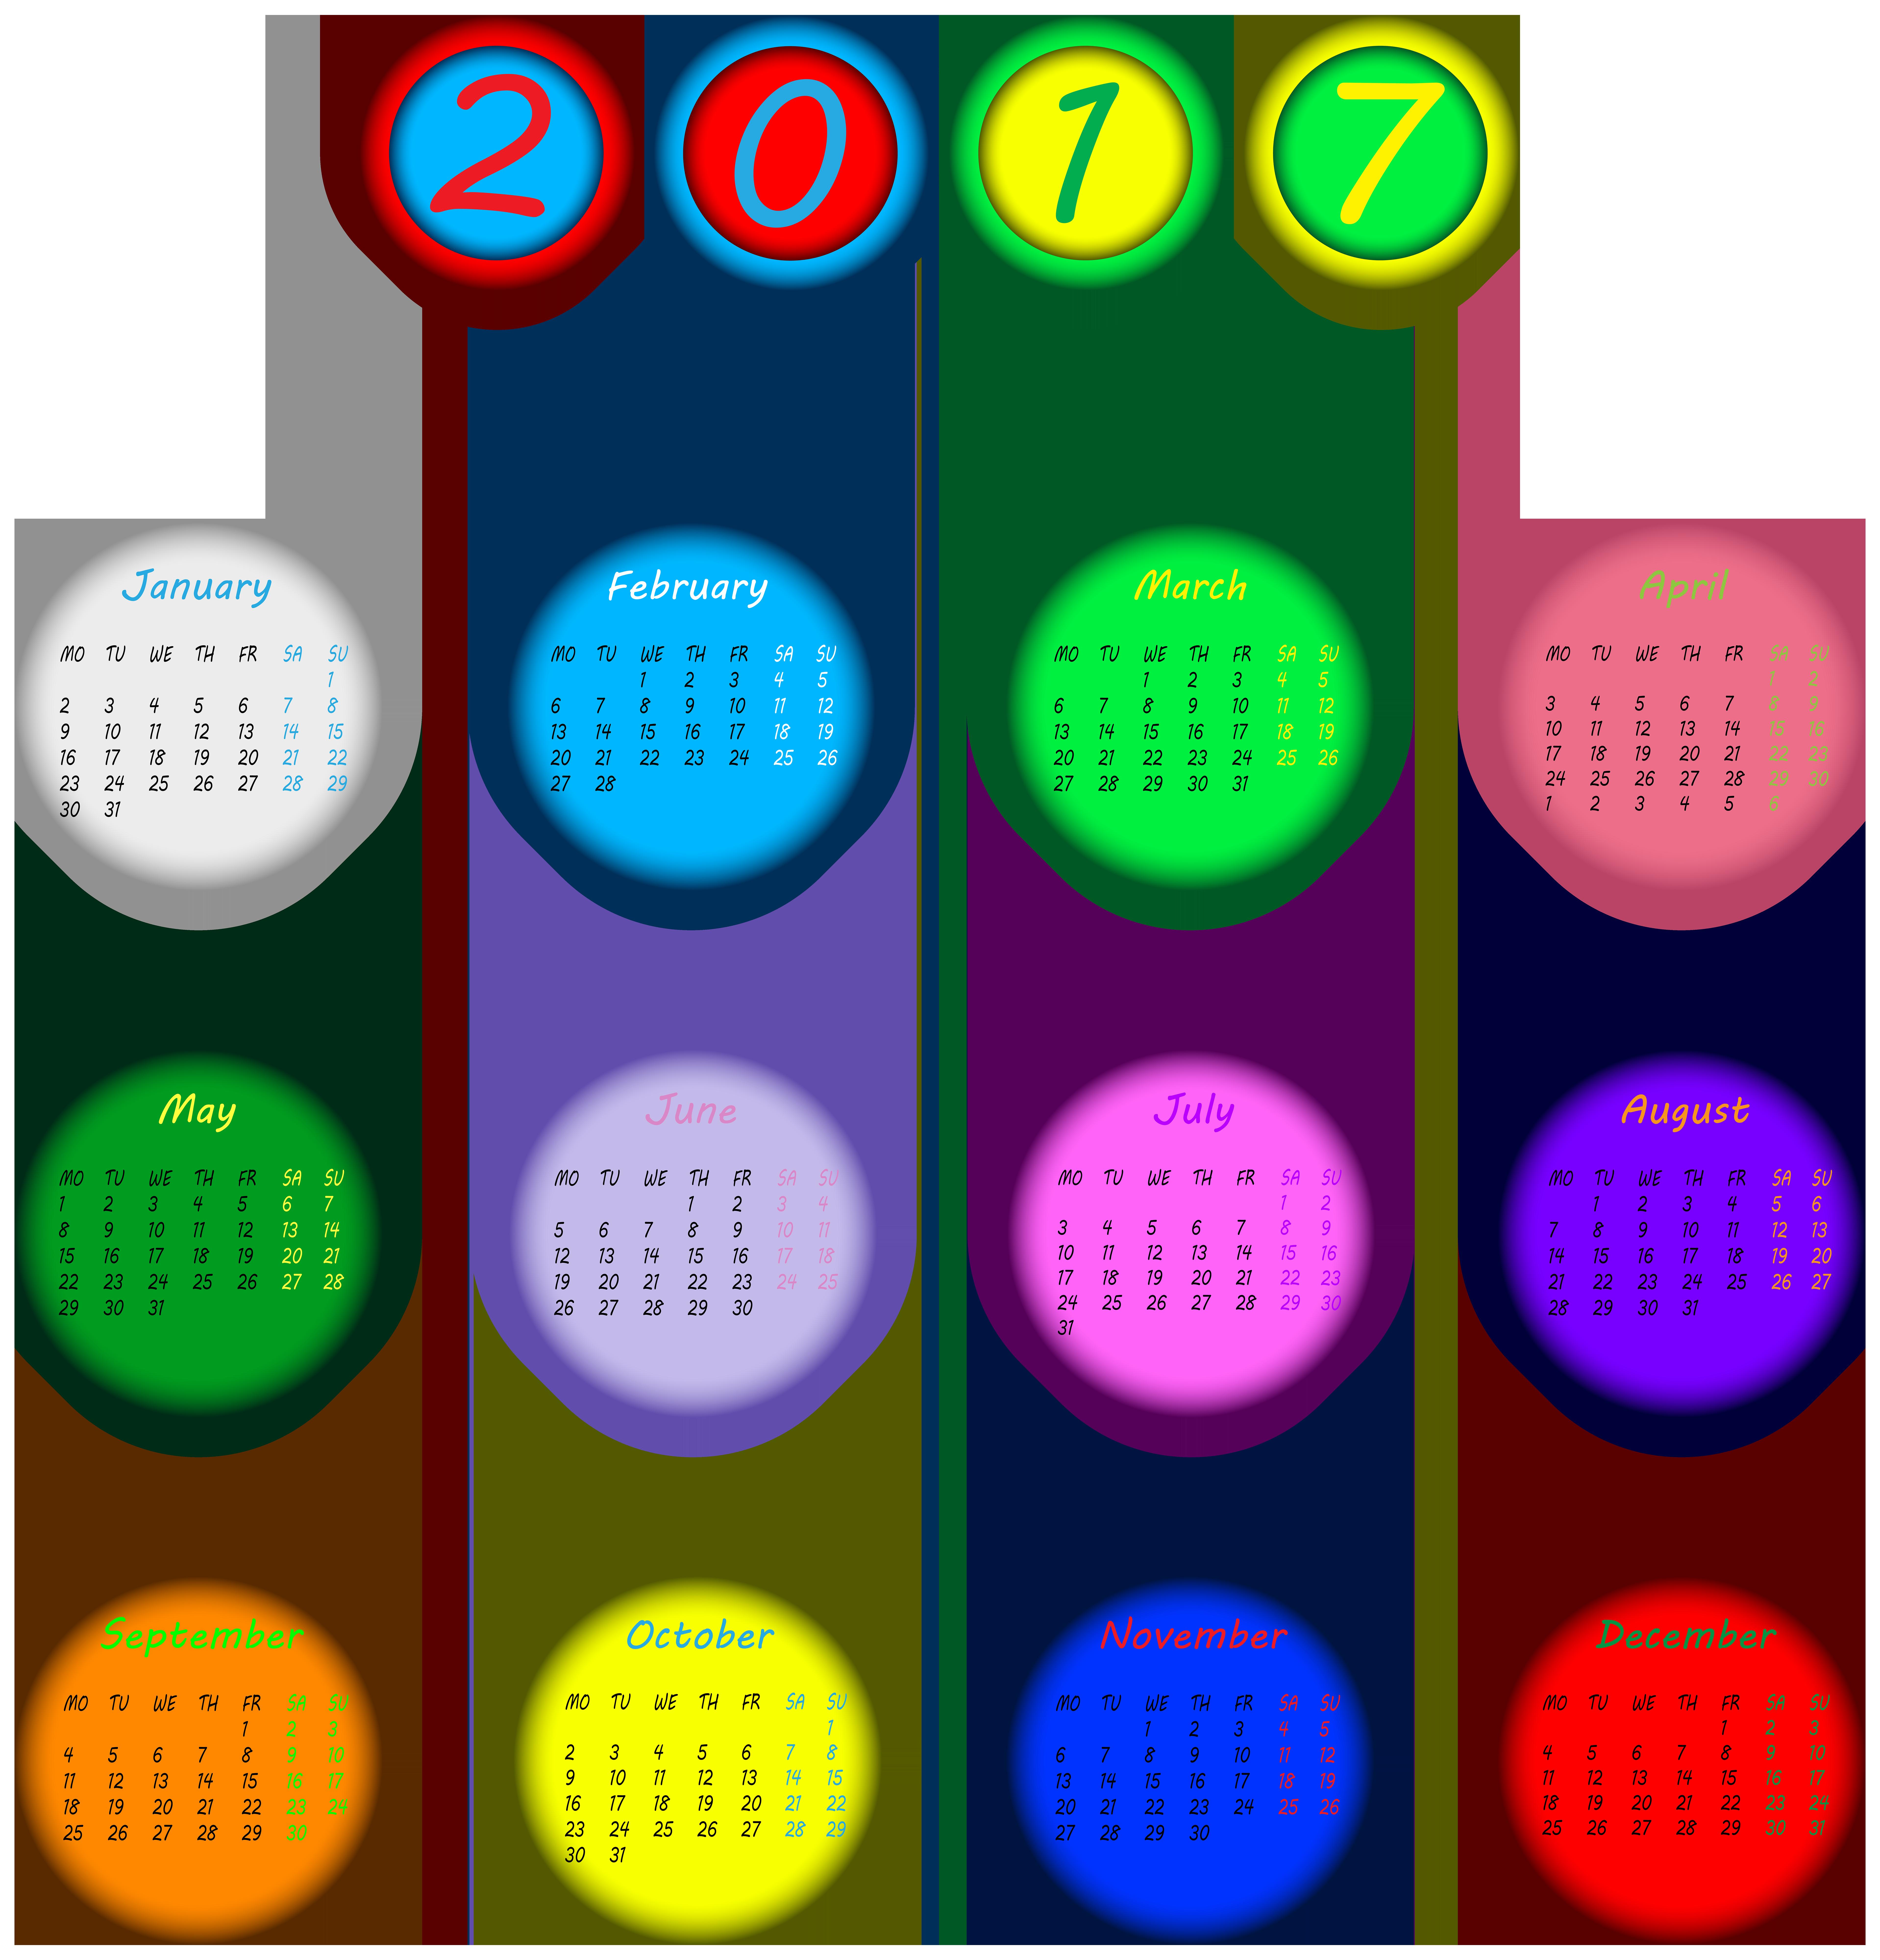 Calendar clipart png transparent library 2017 Multicolored Calendar Transparent PNG Clip Art Image library